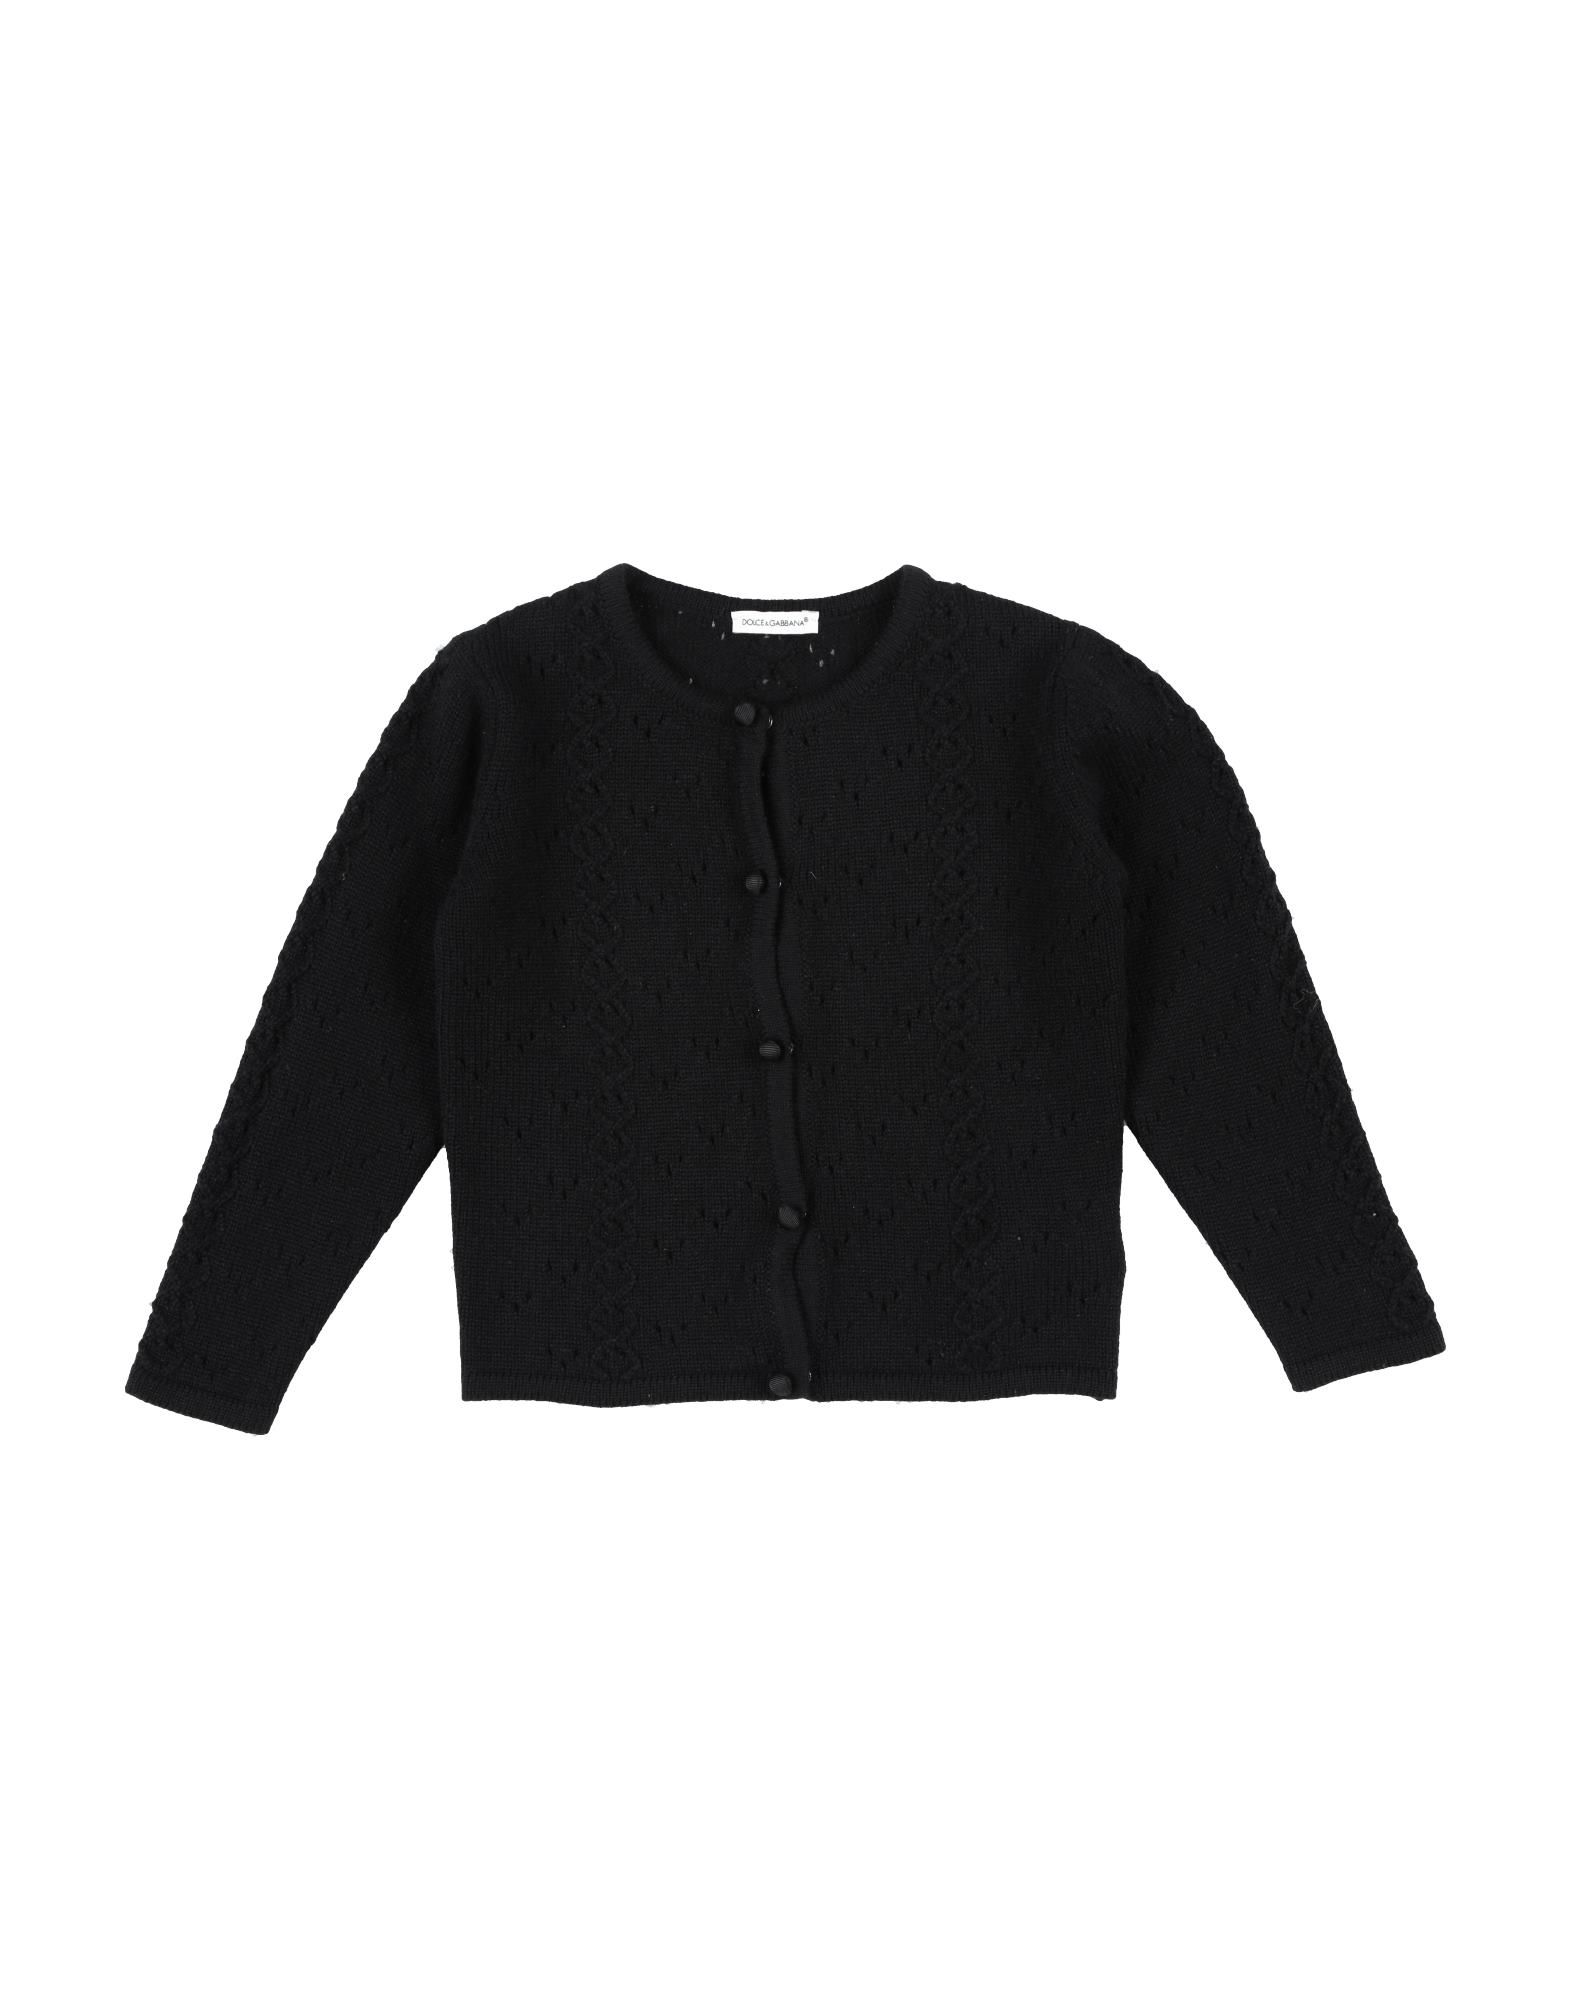 DOLCE & GABBANA Cardigans - Item 39943062